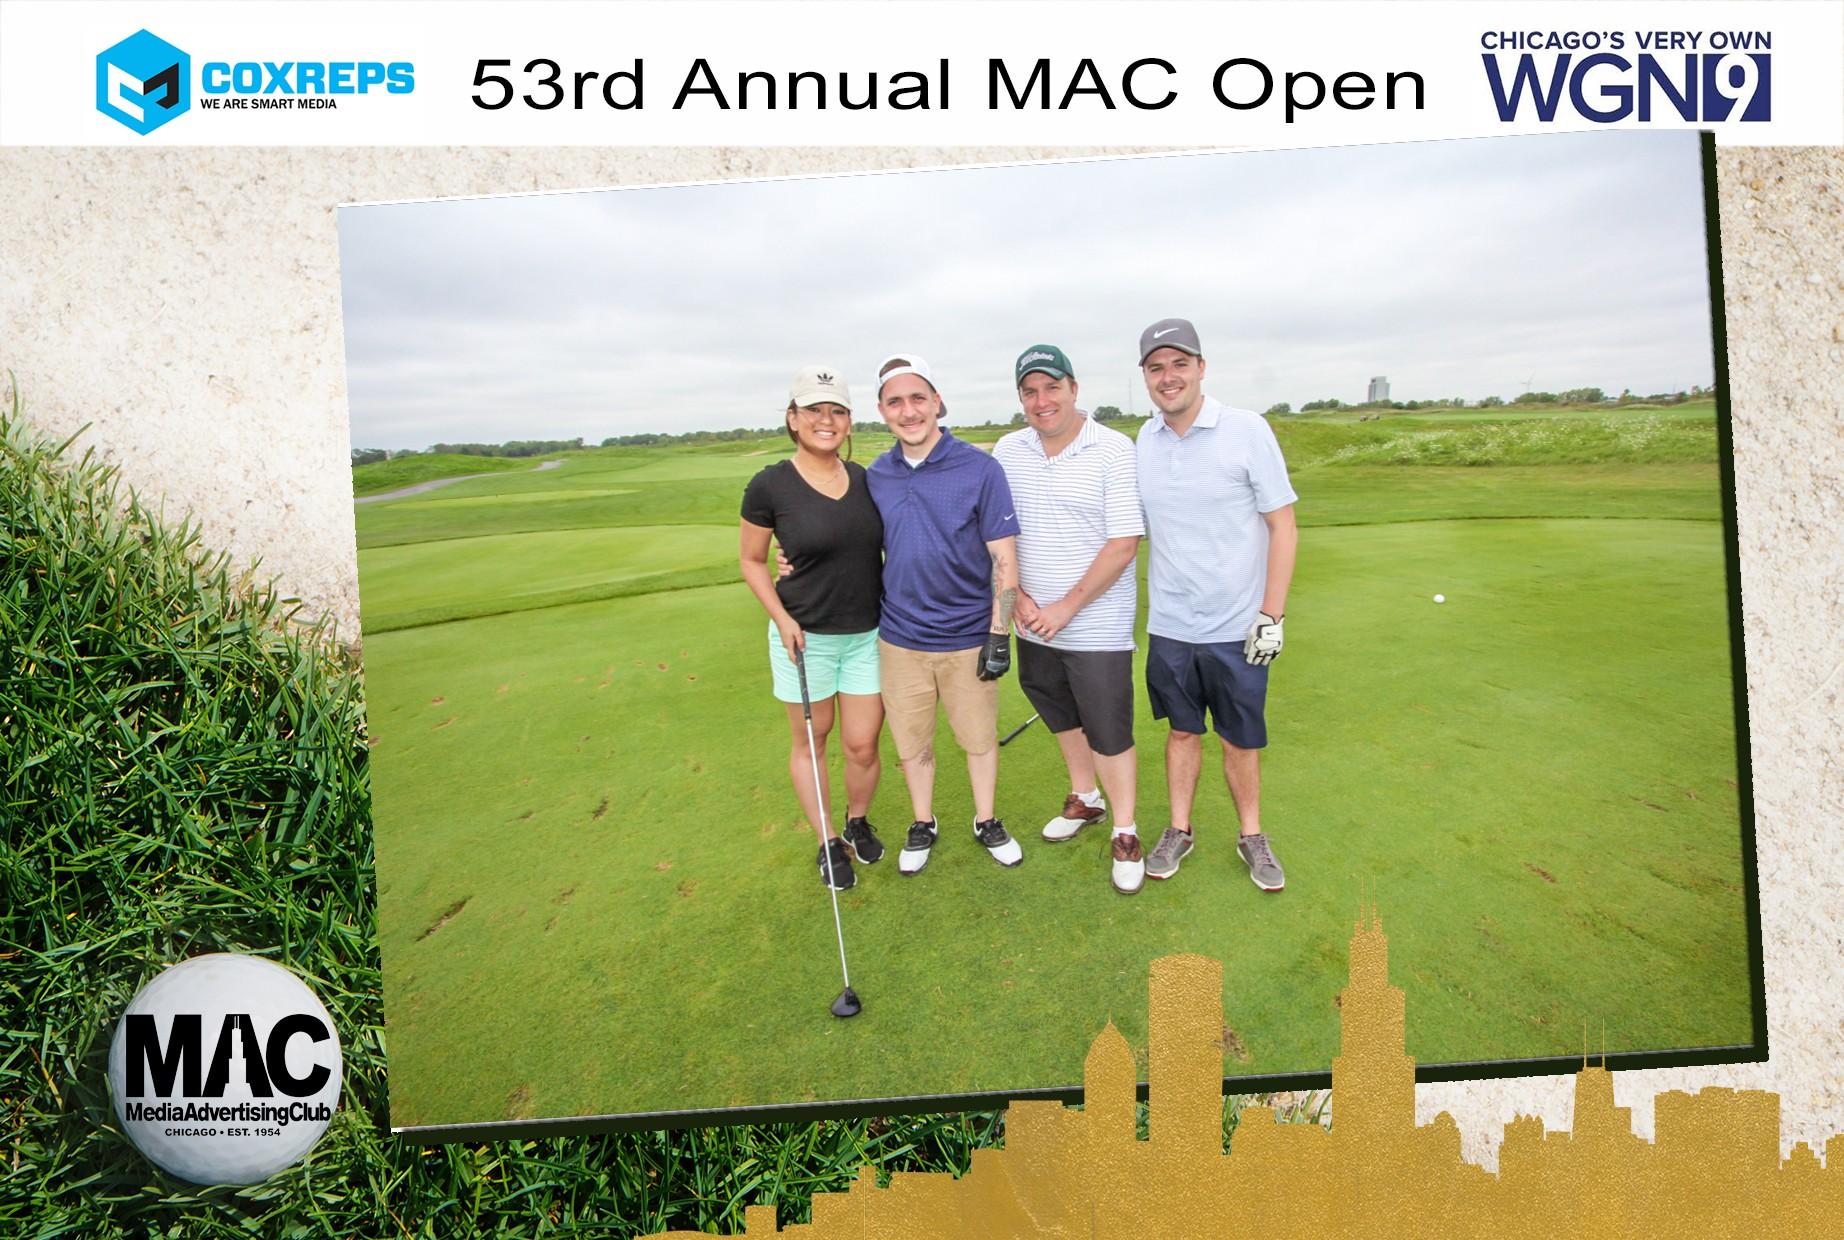 The Mac Media Advertising Club Chicago